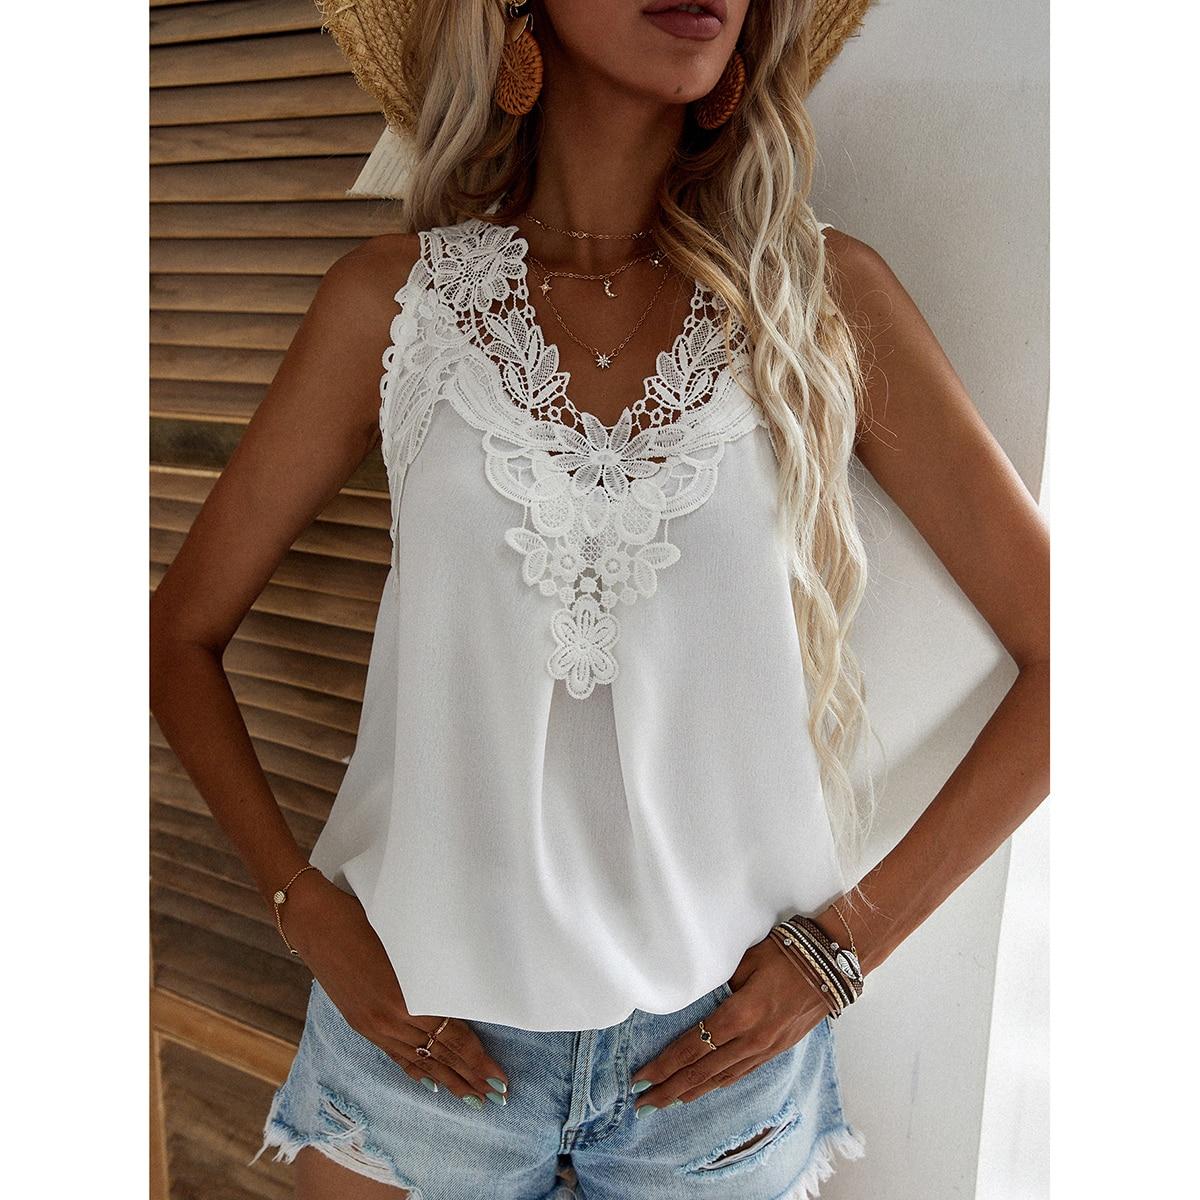 Однотонная блуза с кружевом SheIn swblouse23210415416